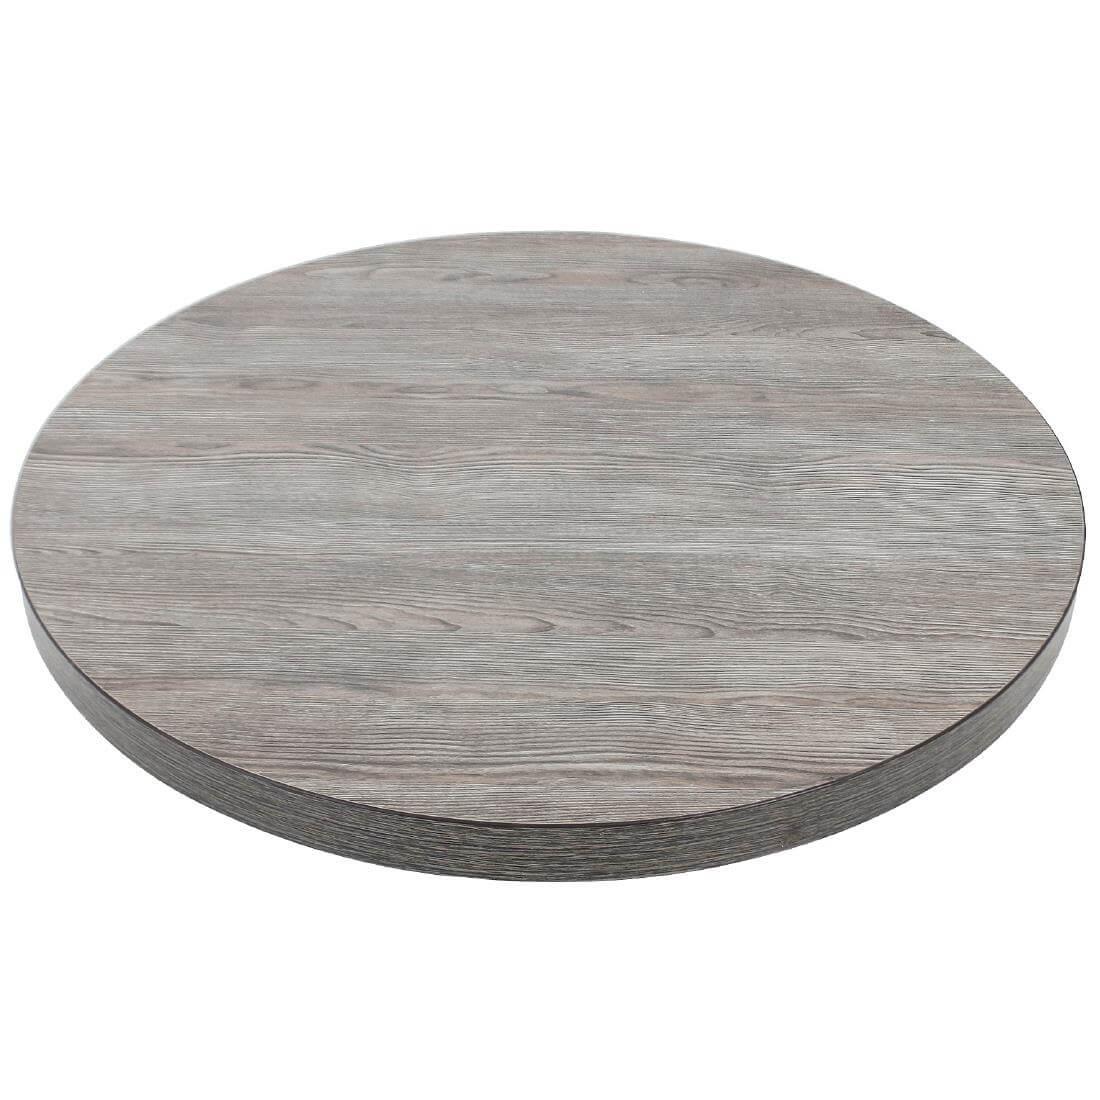 Bolero Thick Round - Vintage Wood